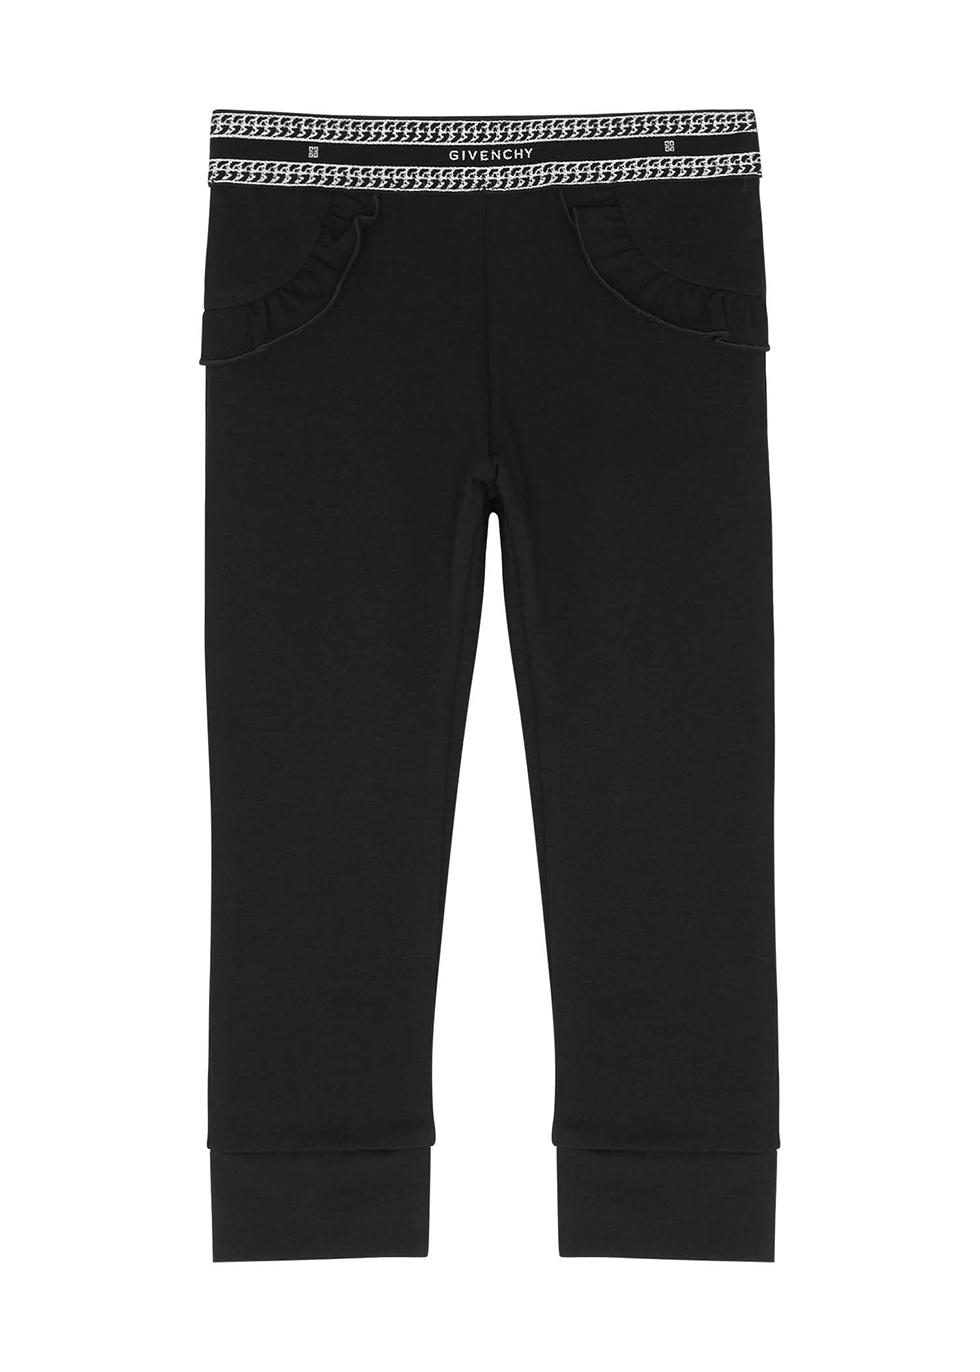 Black logo cotton-blend leggings (24-36 months)